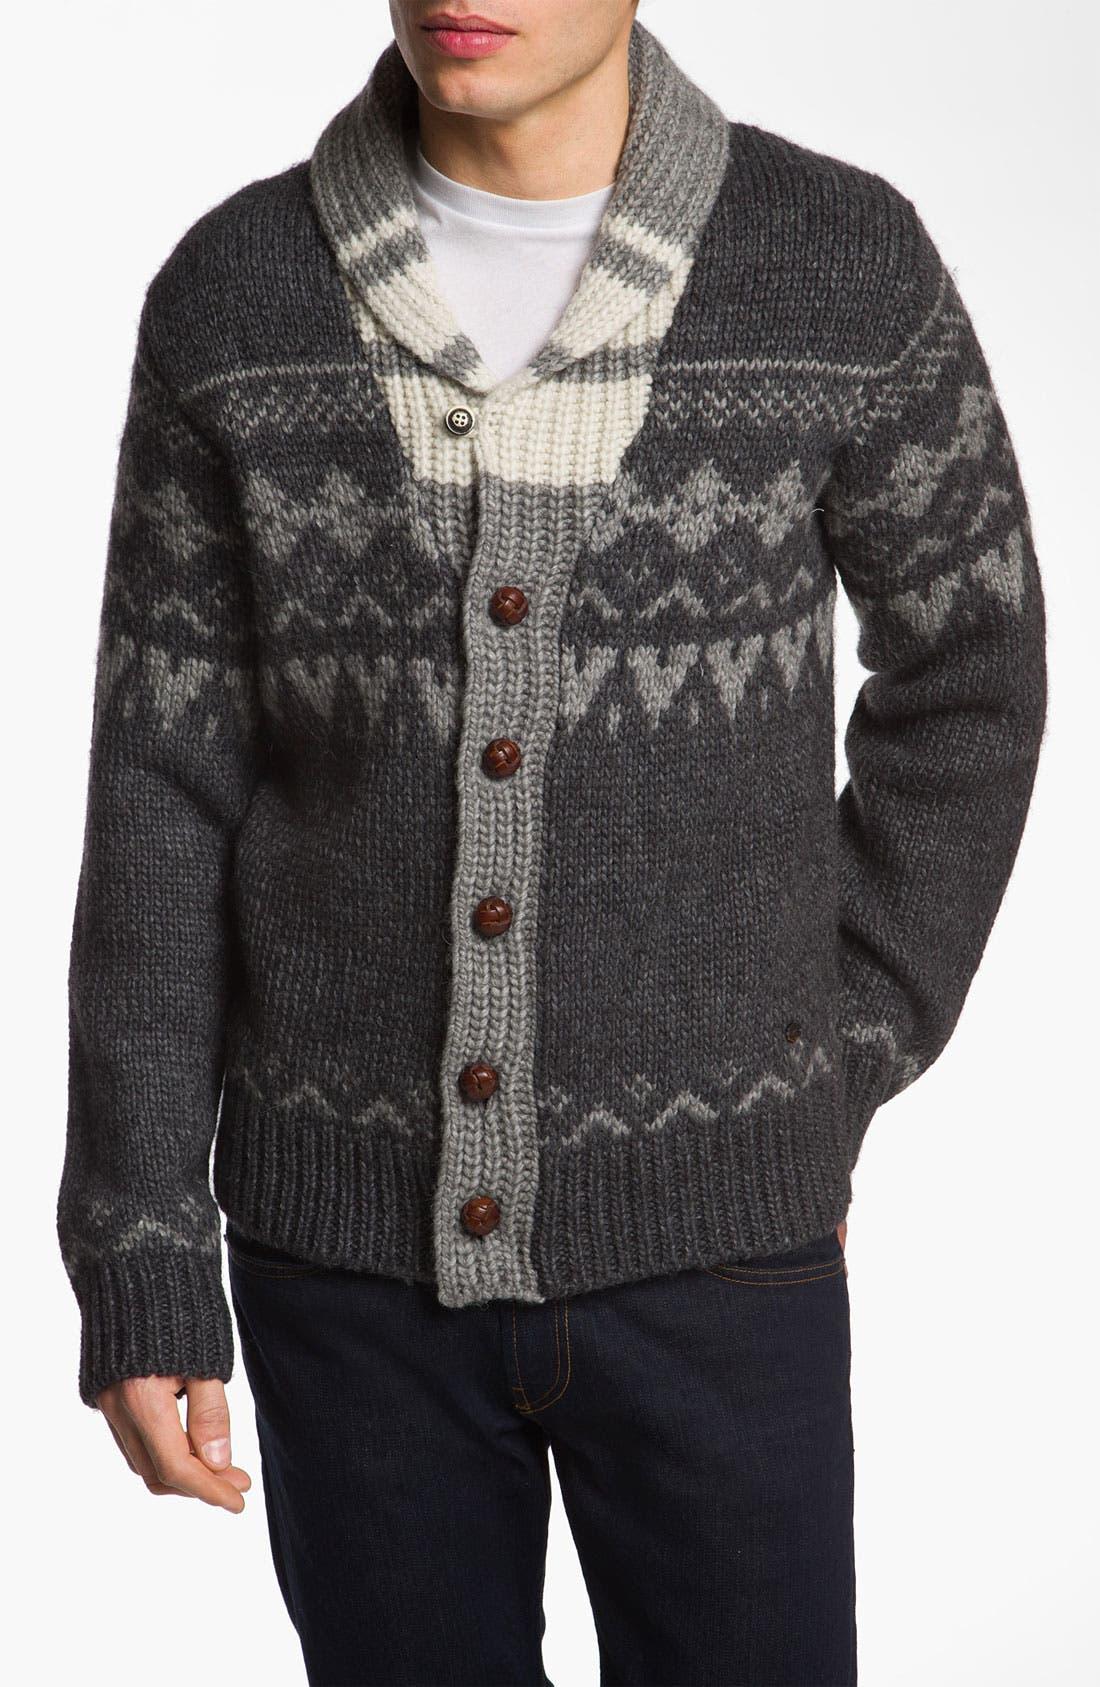 Main Image - Woolrich John Rich 'Trapper Peak' Shawl Collar Cardigan